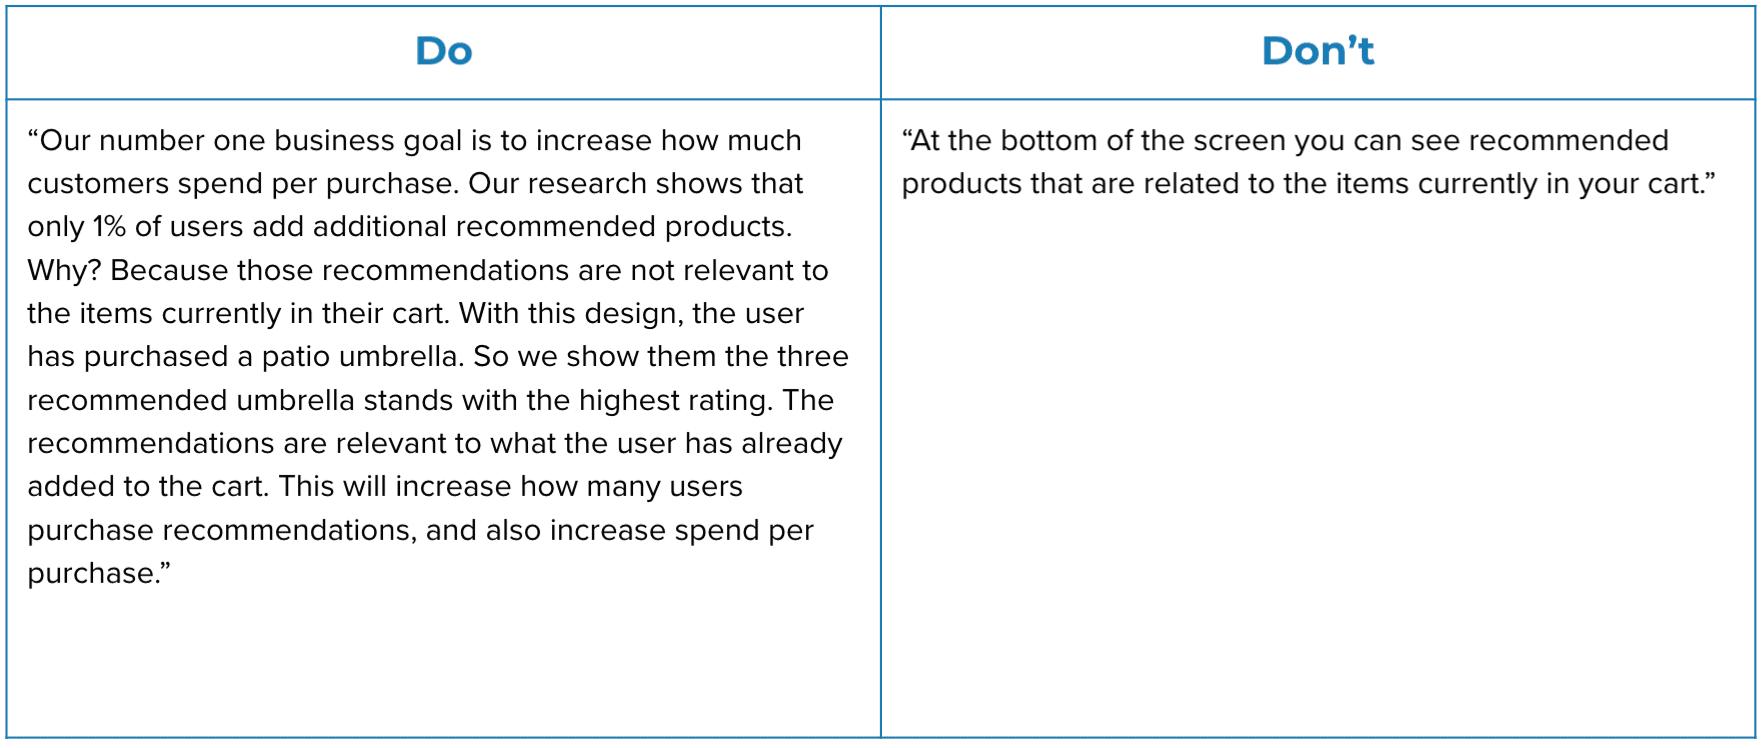 Design Presentation - Explain Rationale